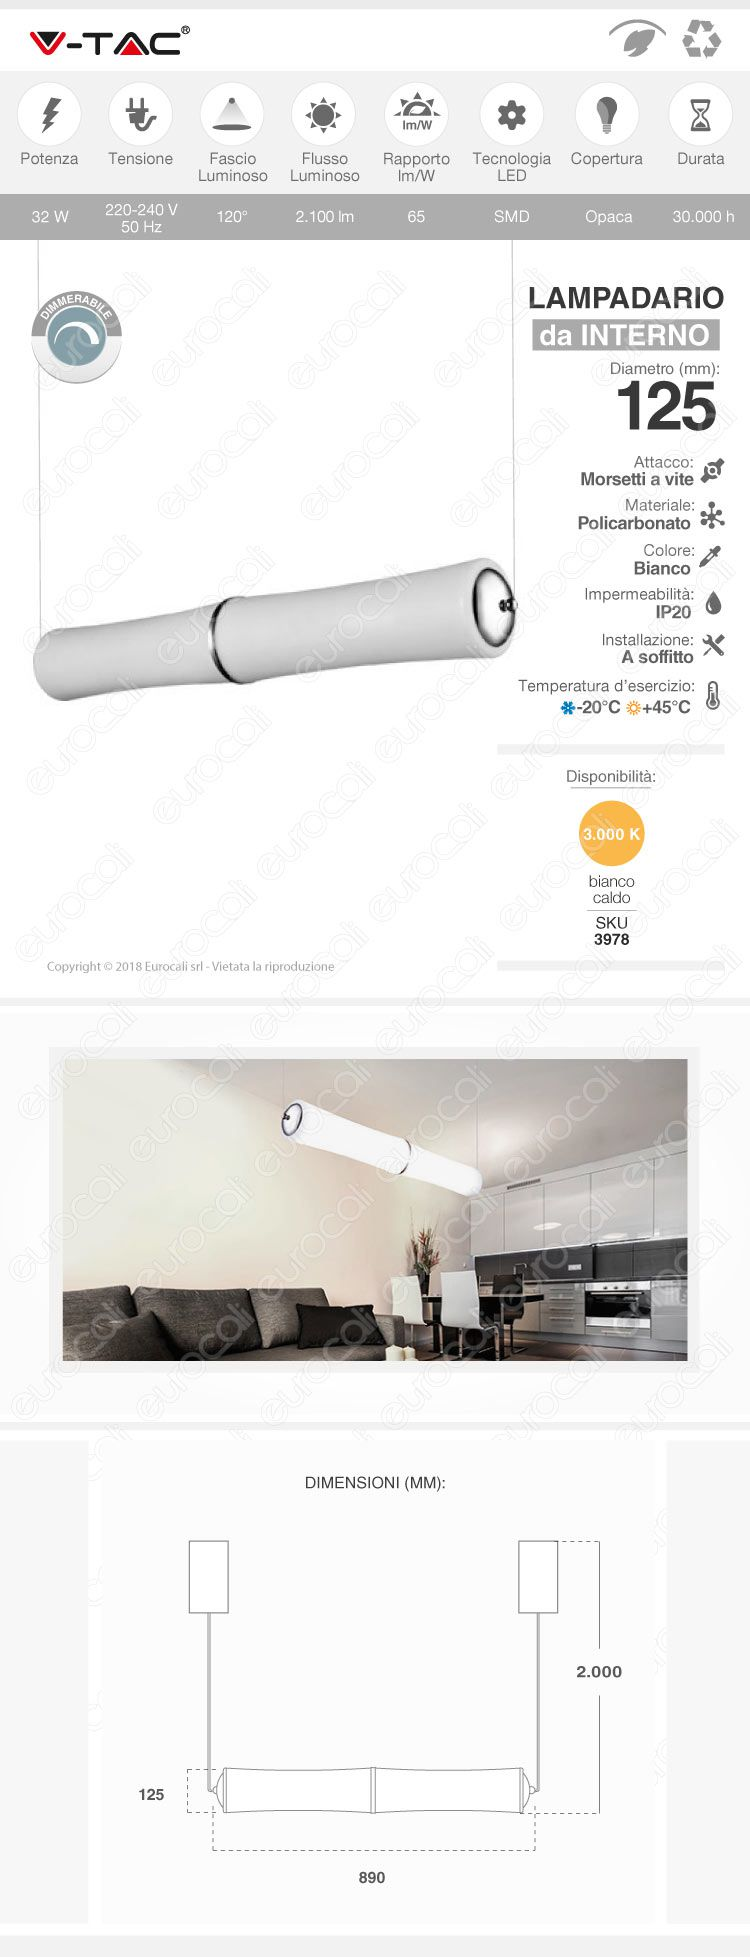 lampada v-tac vt-7049 led da muro